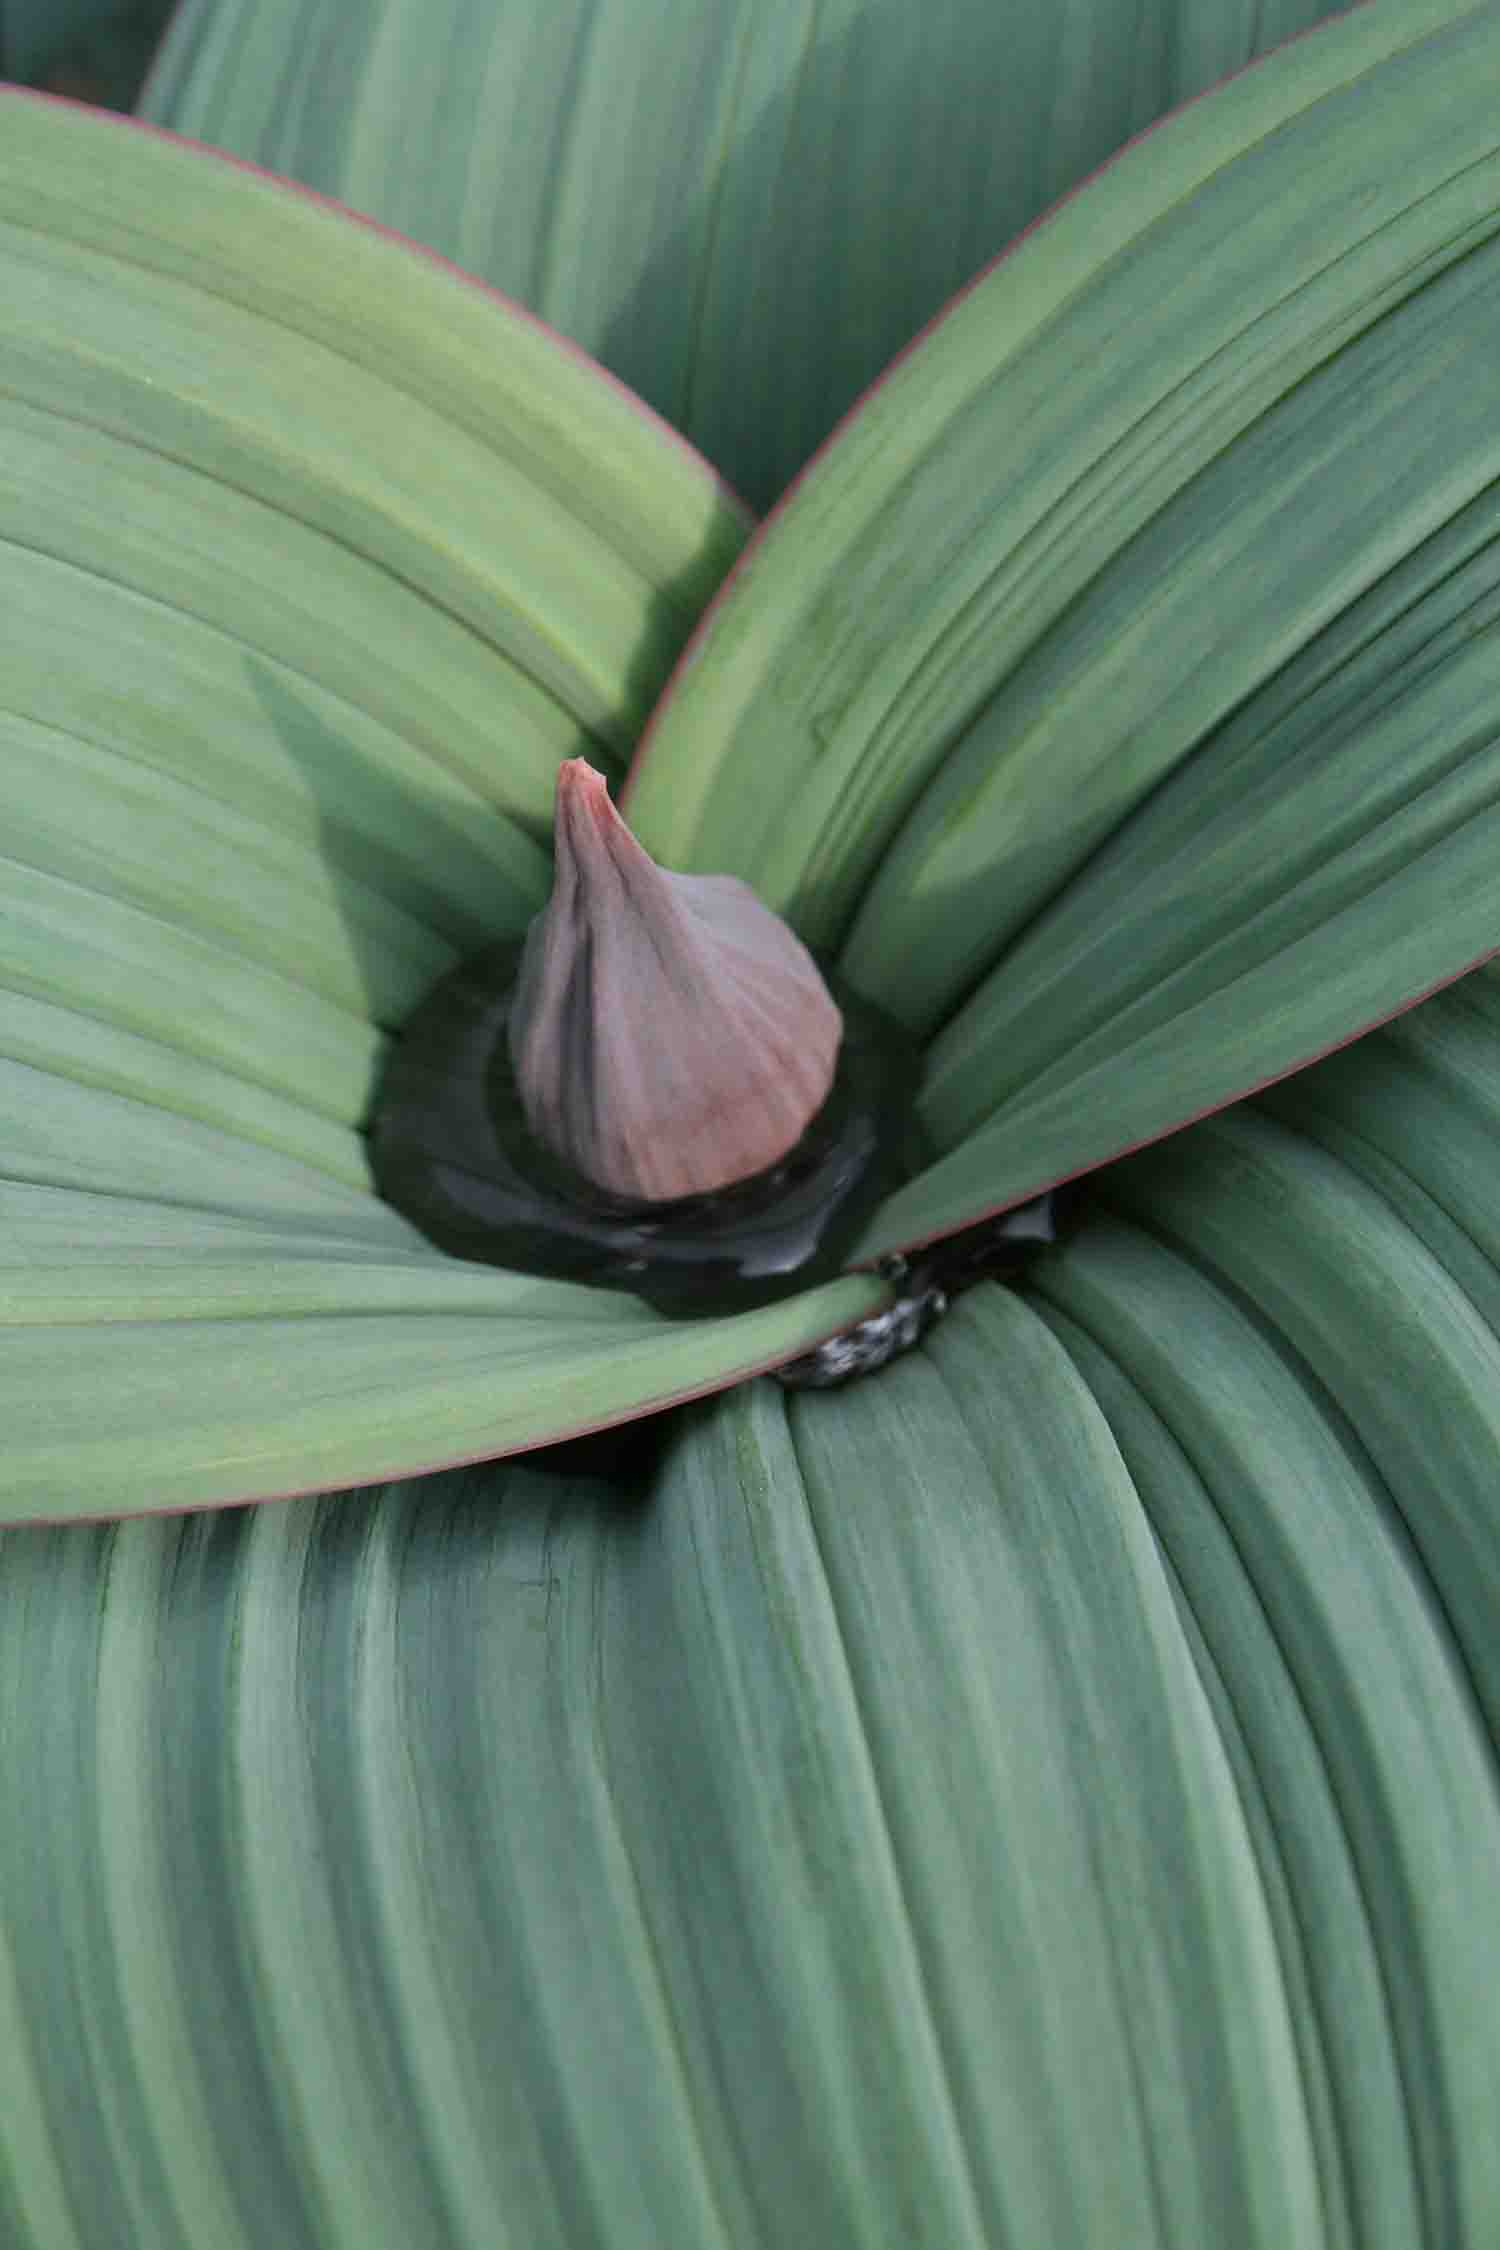 Allium karataviense ssp. henrikii